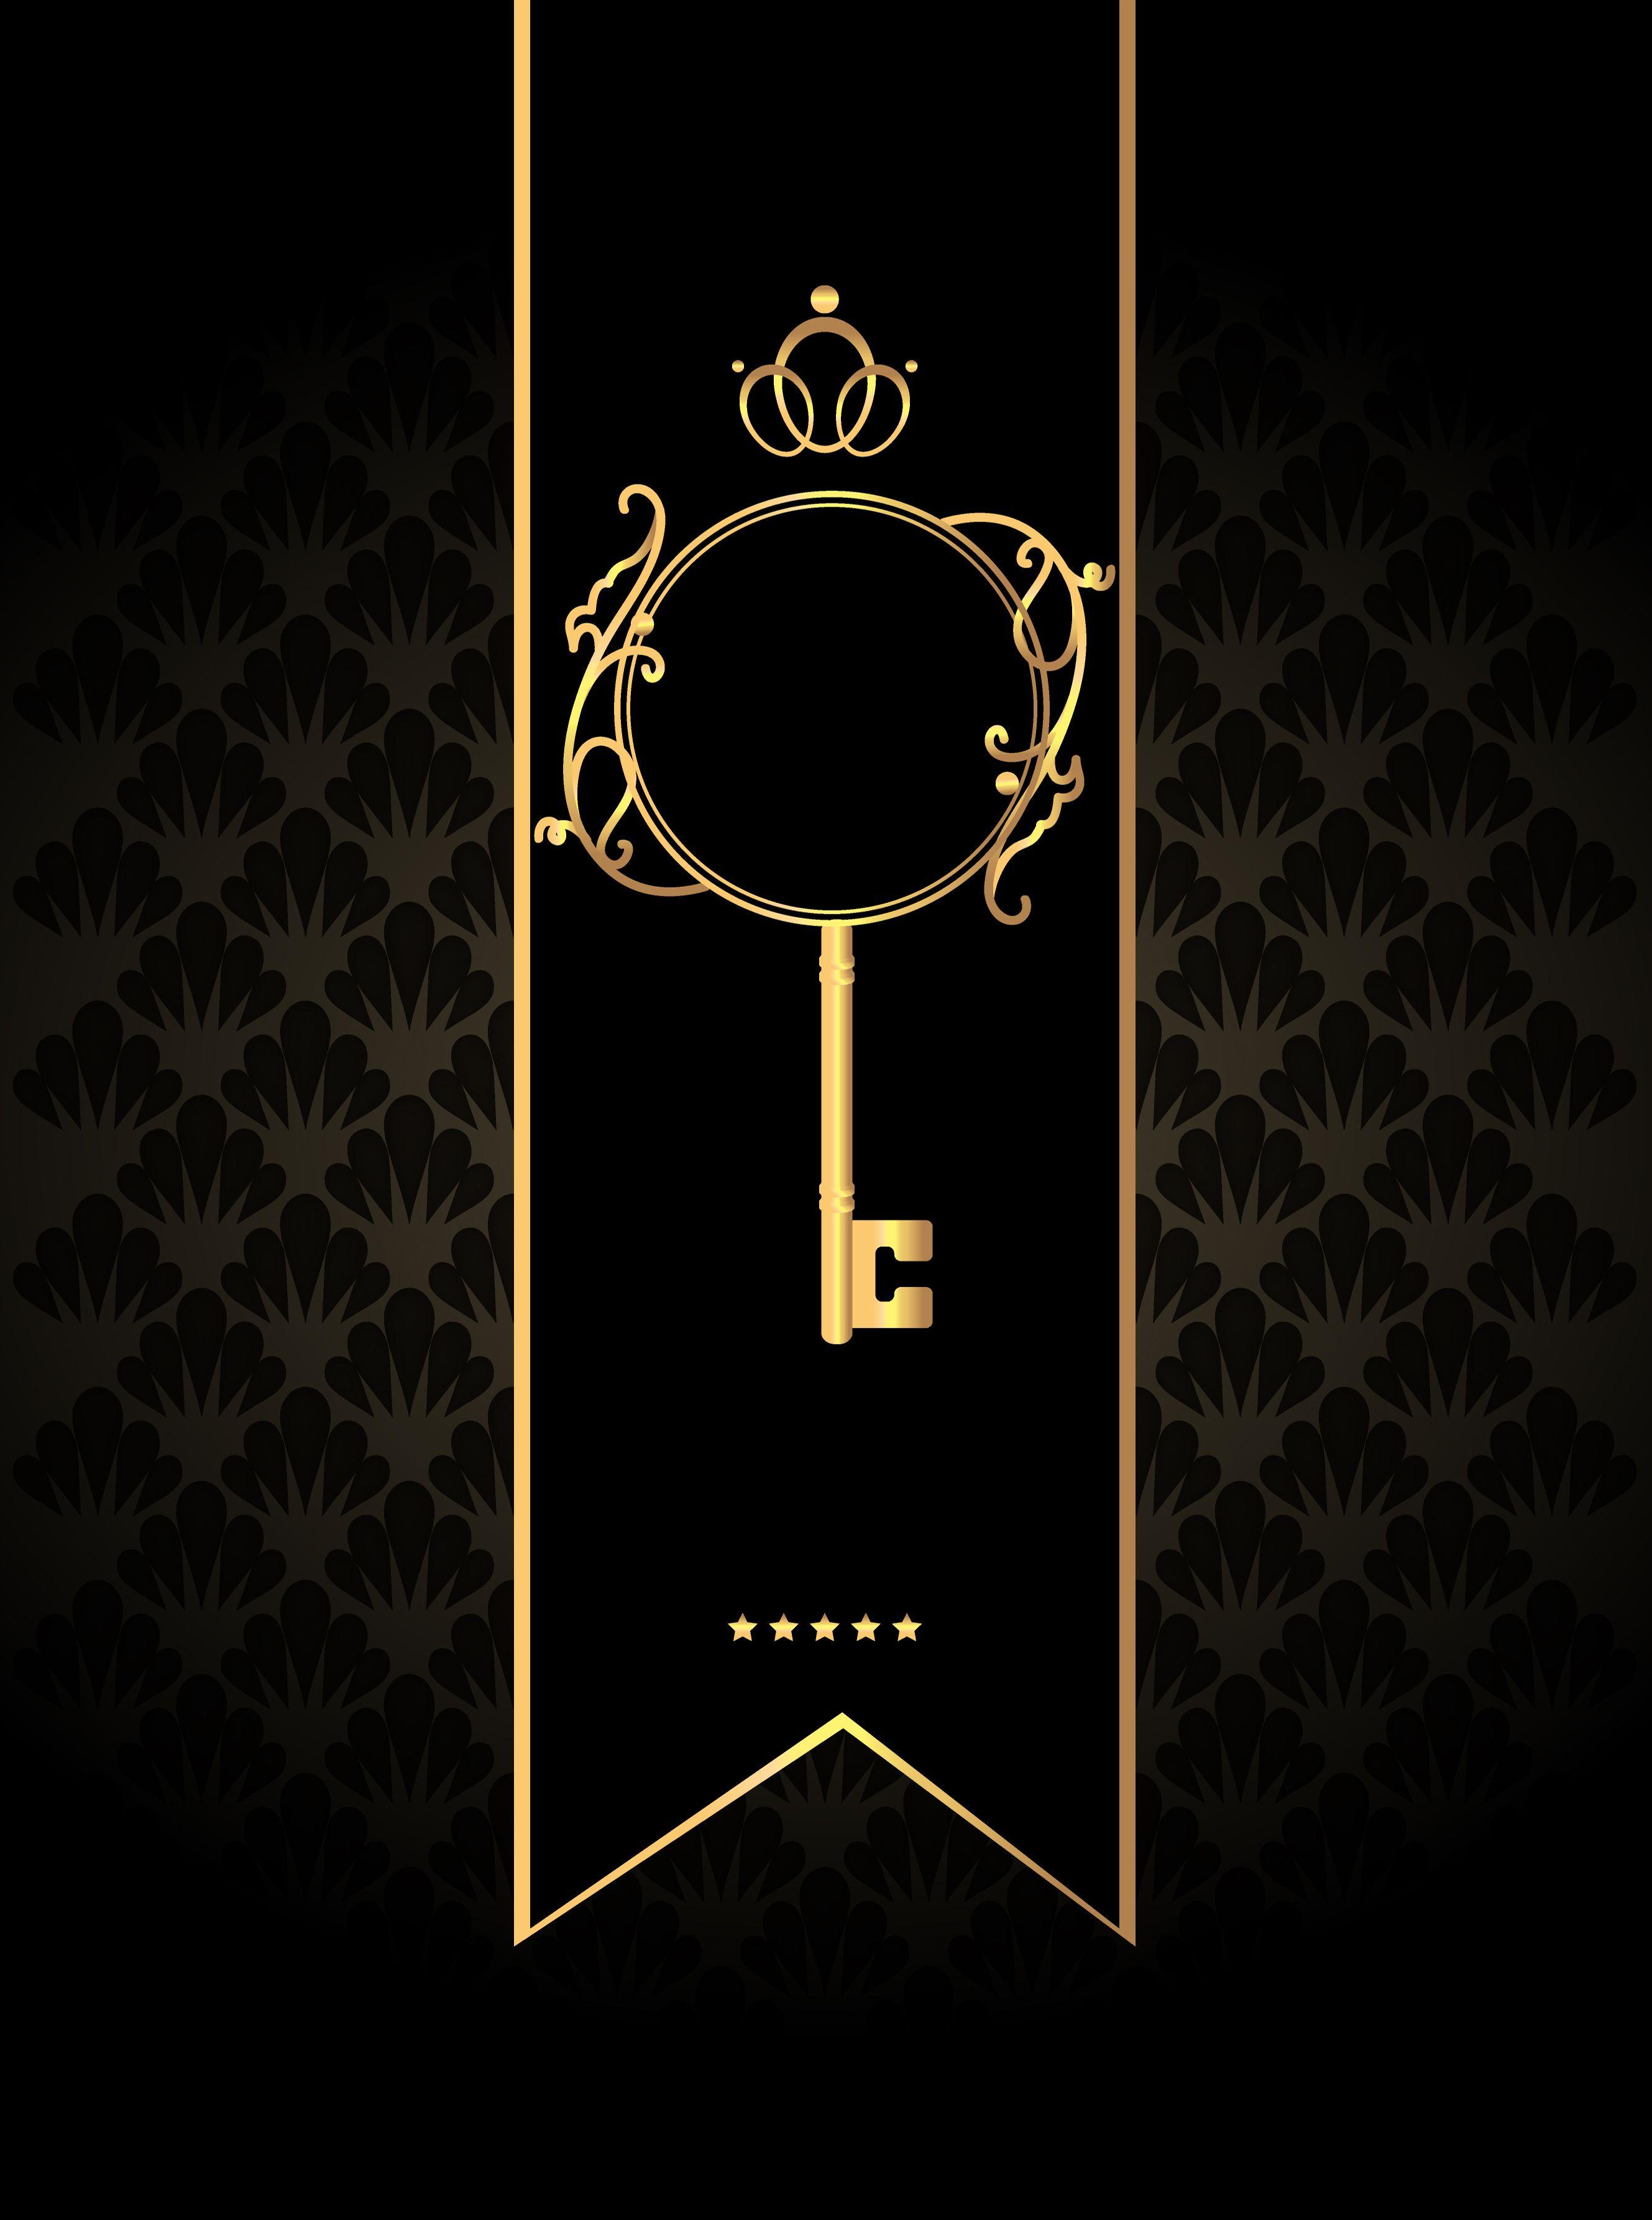 Black Background Invitations Background Vector Golden Key Golden Key Invitation Background Art Deco Borders